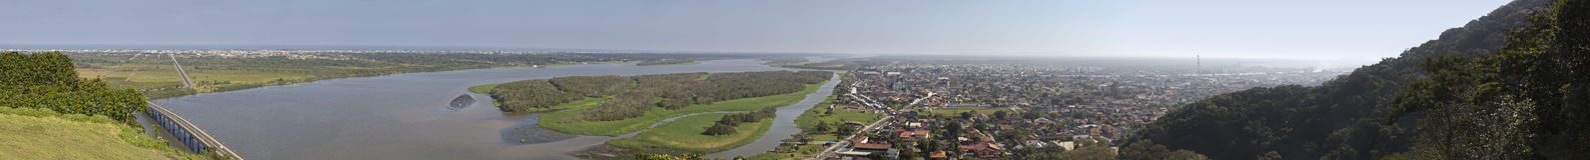 Iguape - panoramautsikt Arkivfoton